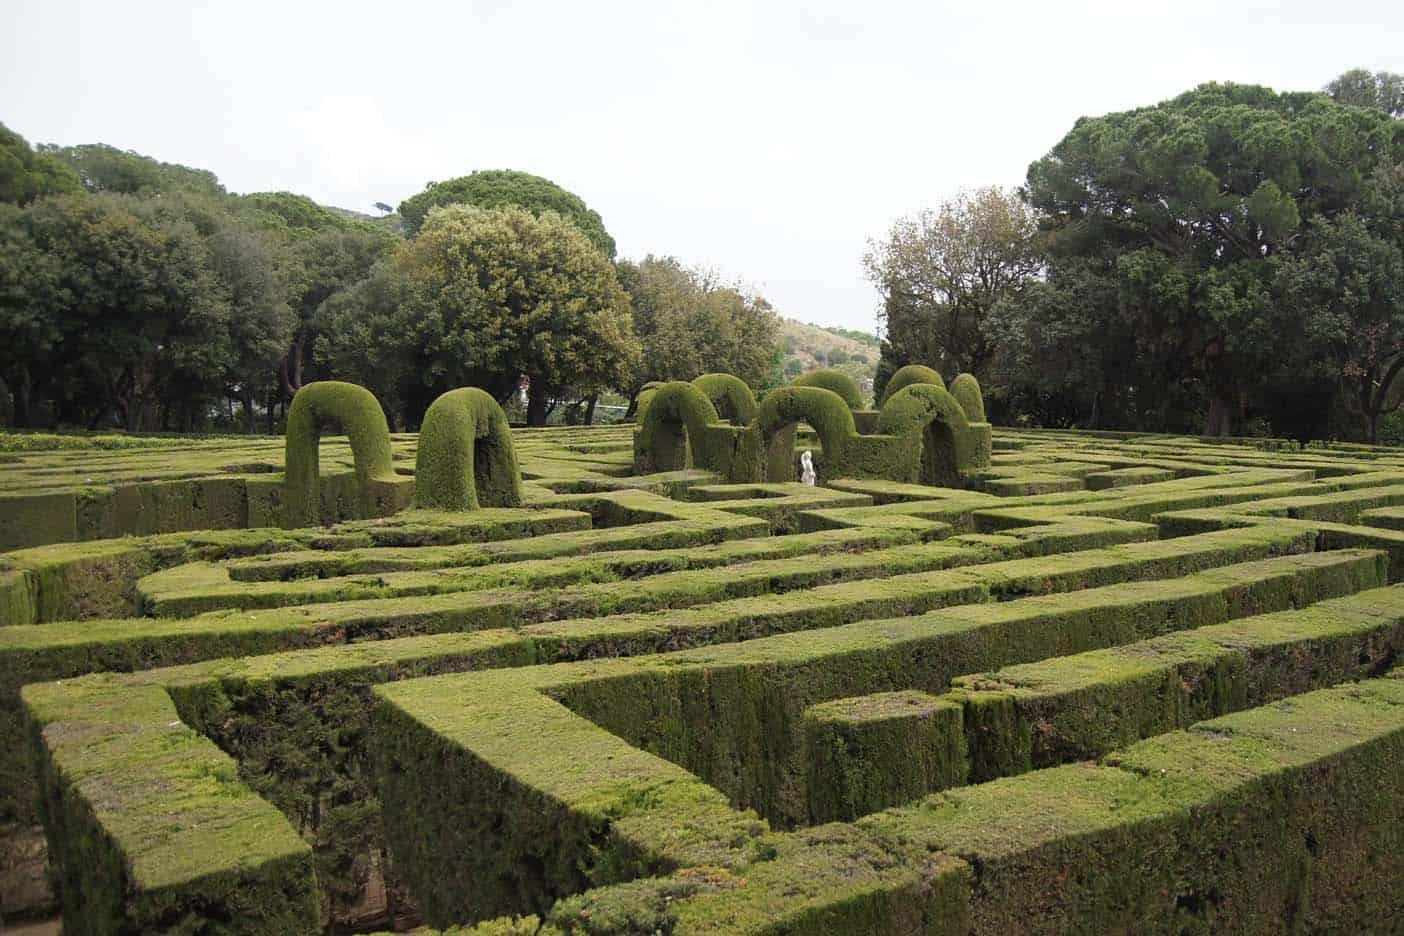 Barcelona met kinderen Park La orta Labyrinth